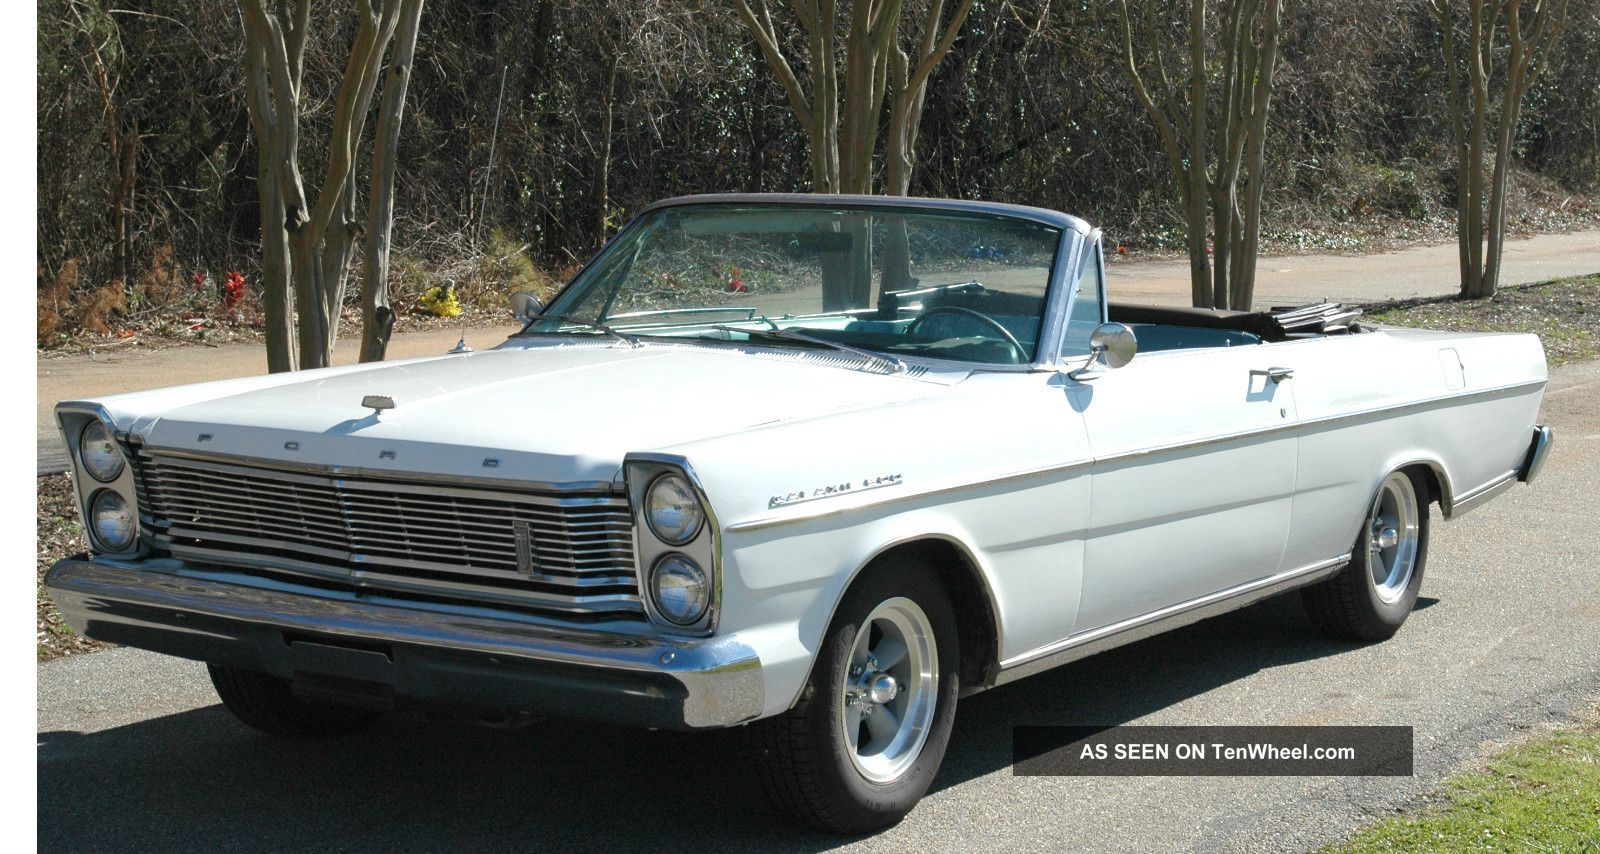 1965 Ford Galaxie Convertible